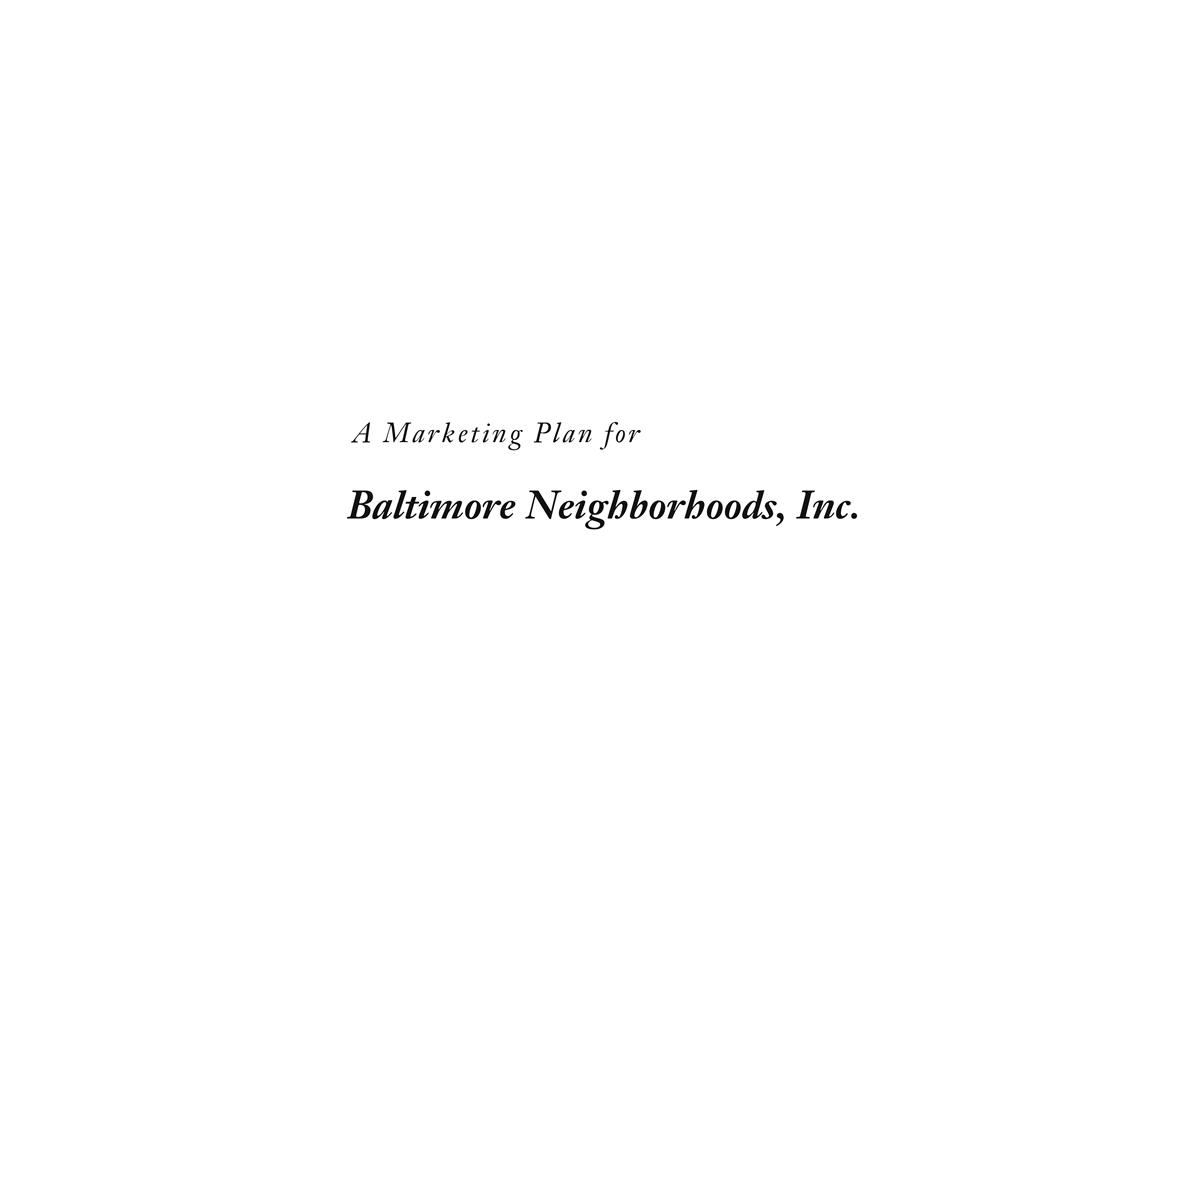 Baltimore Neighborhoods Inc. Marketing Plan